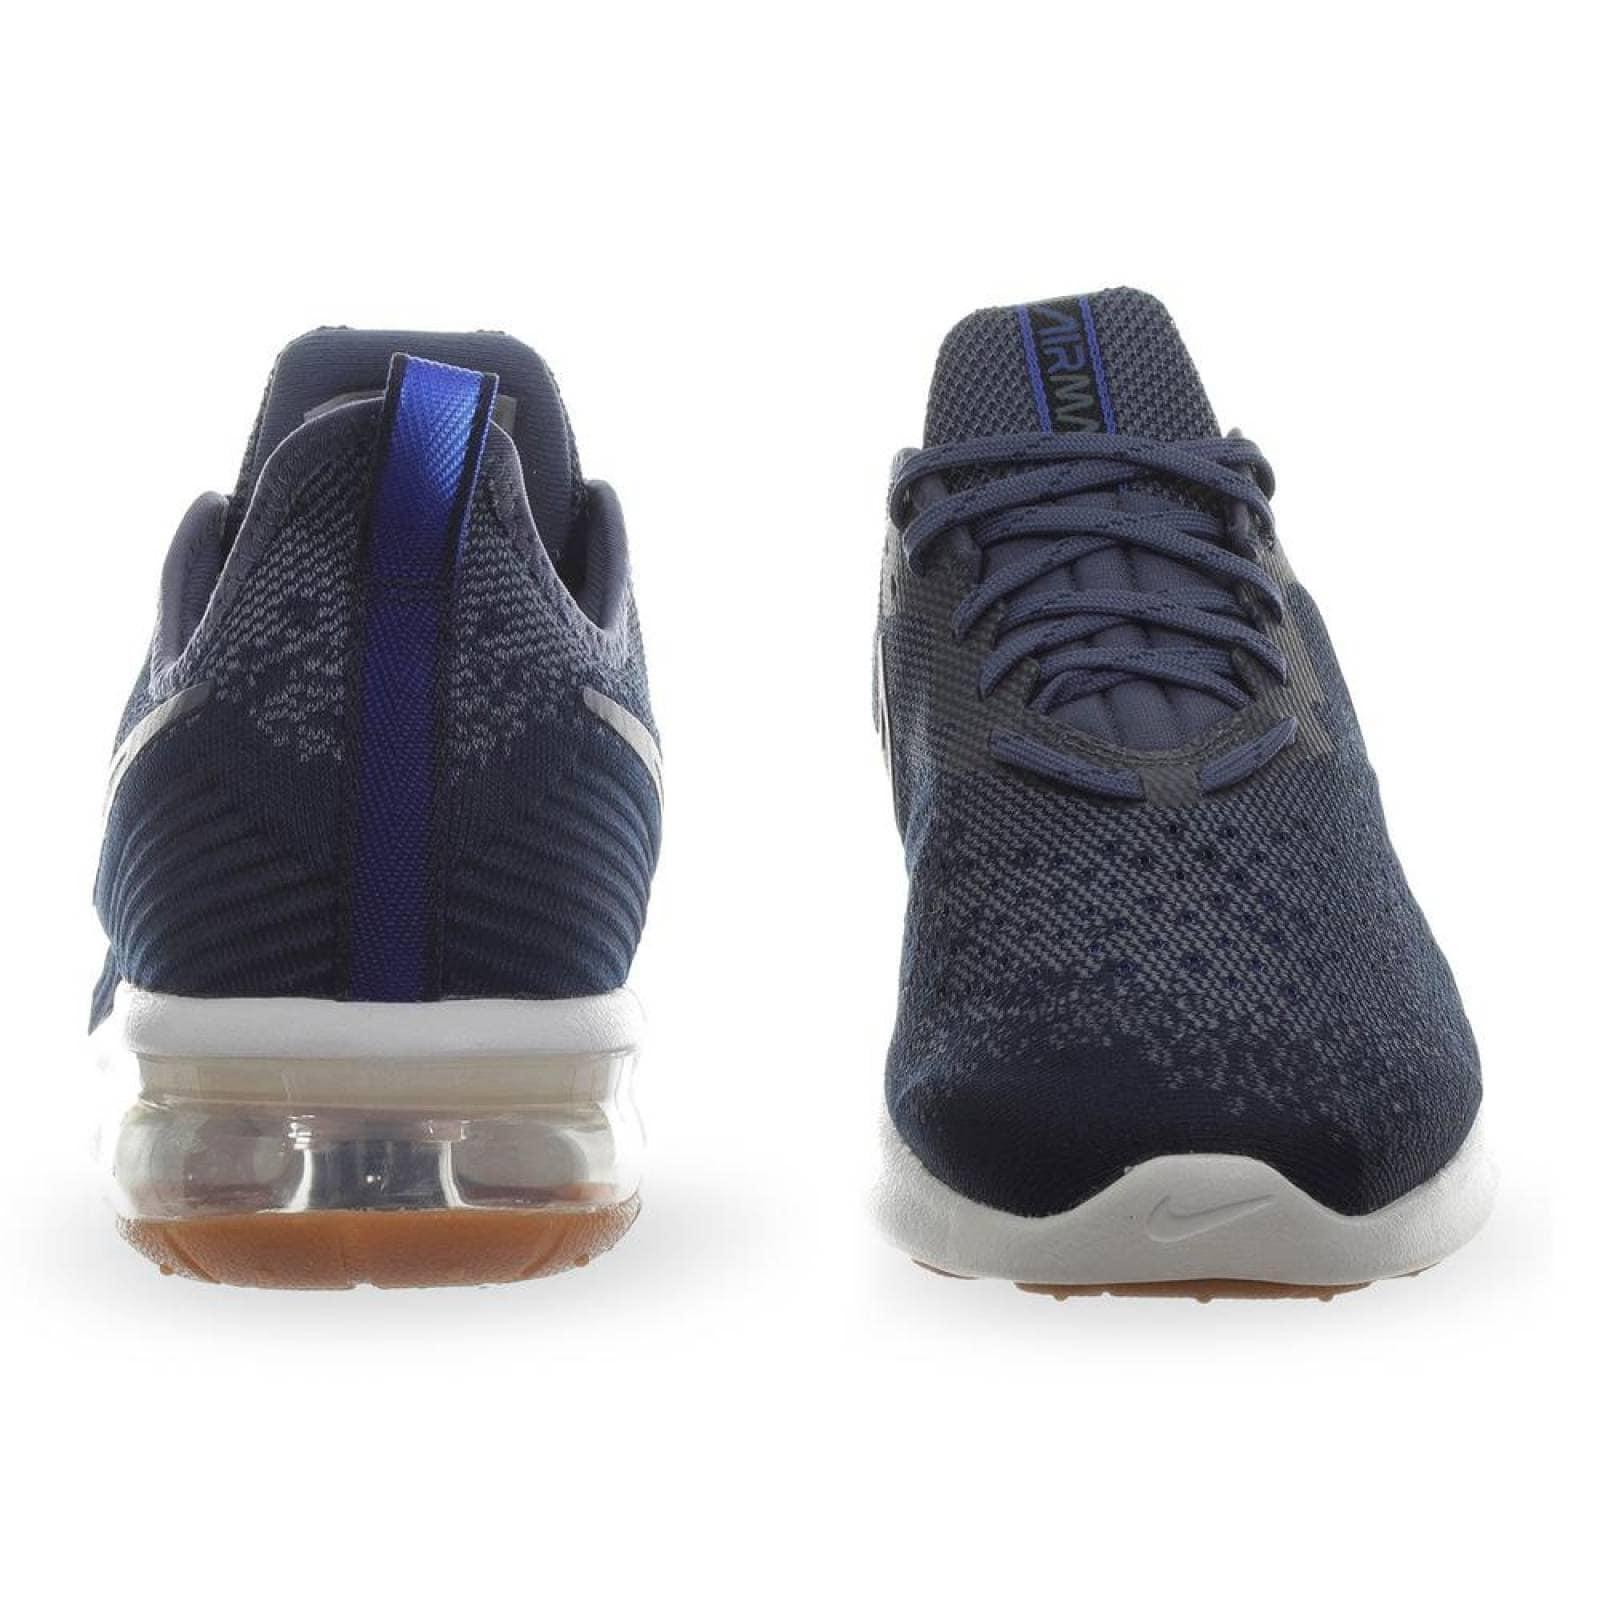 Tenis Nike Air Max Sequent 4 AO4485400 Azul Acero Hombre